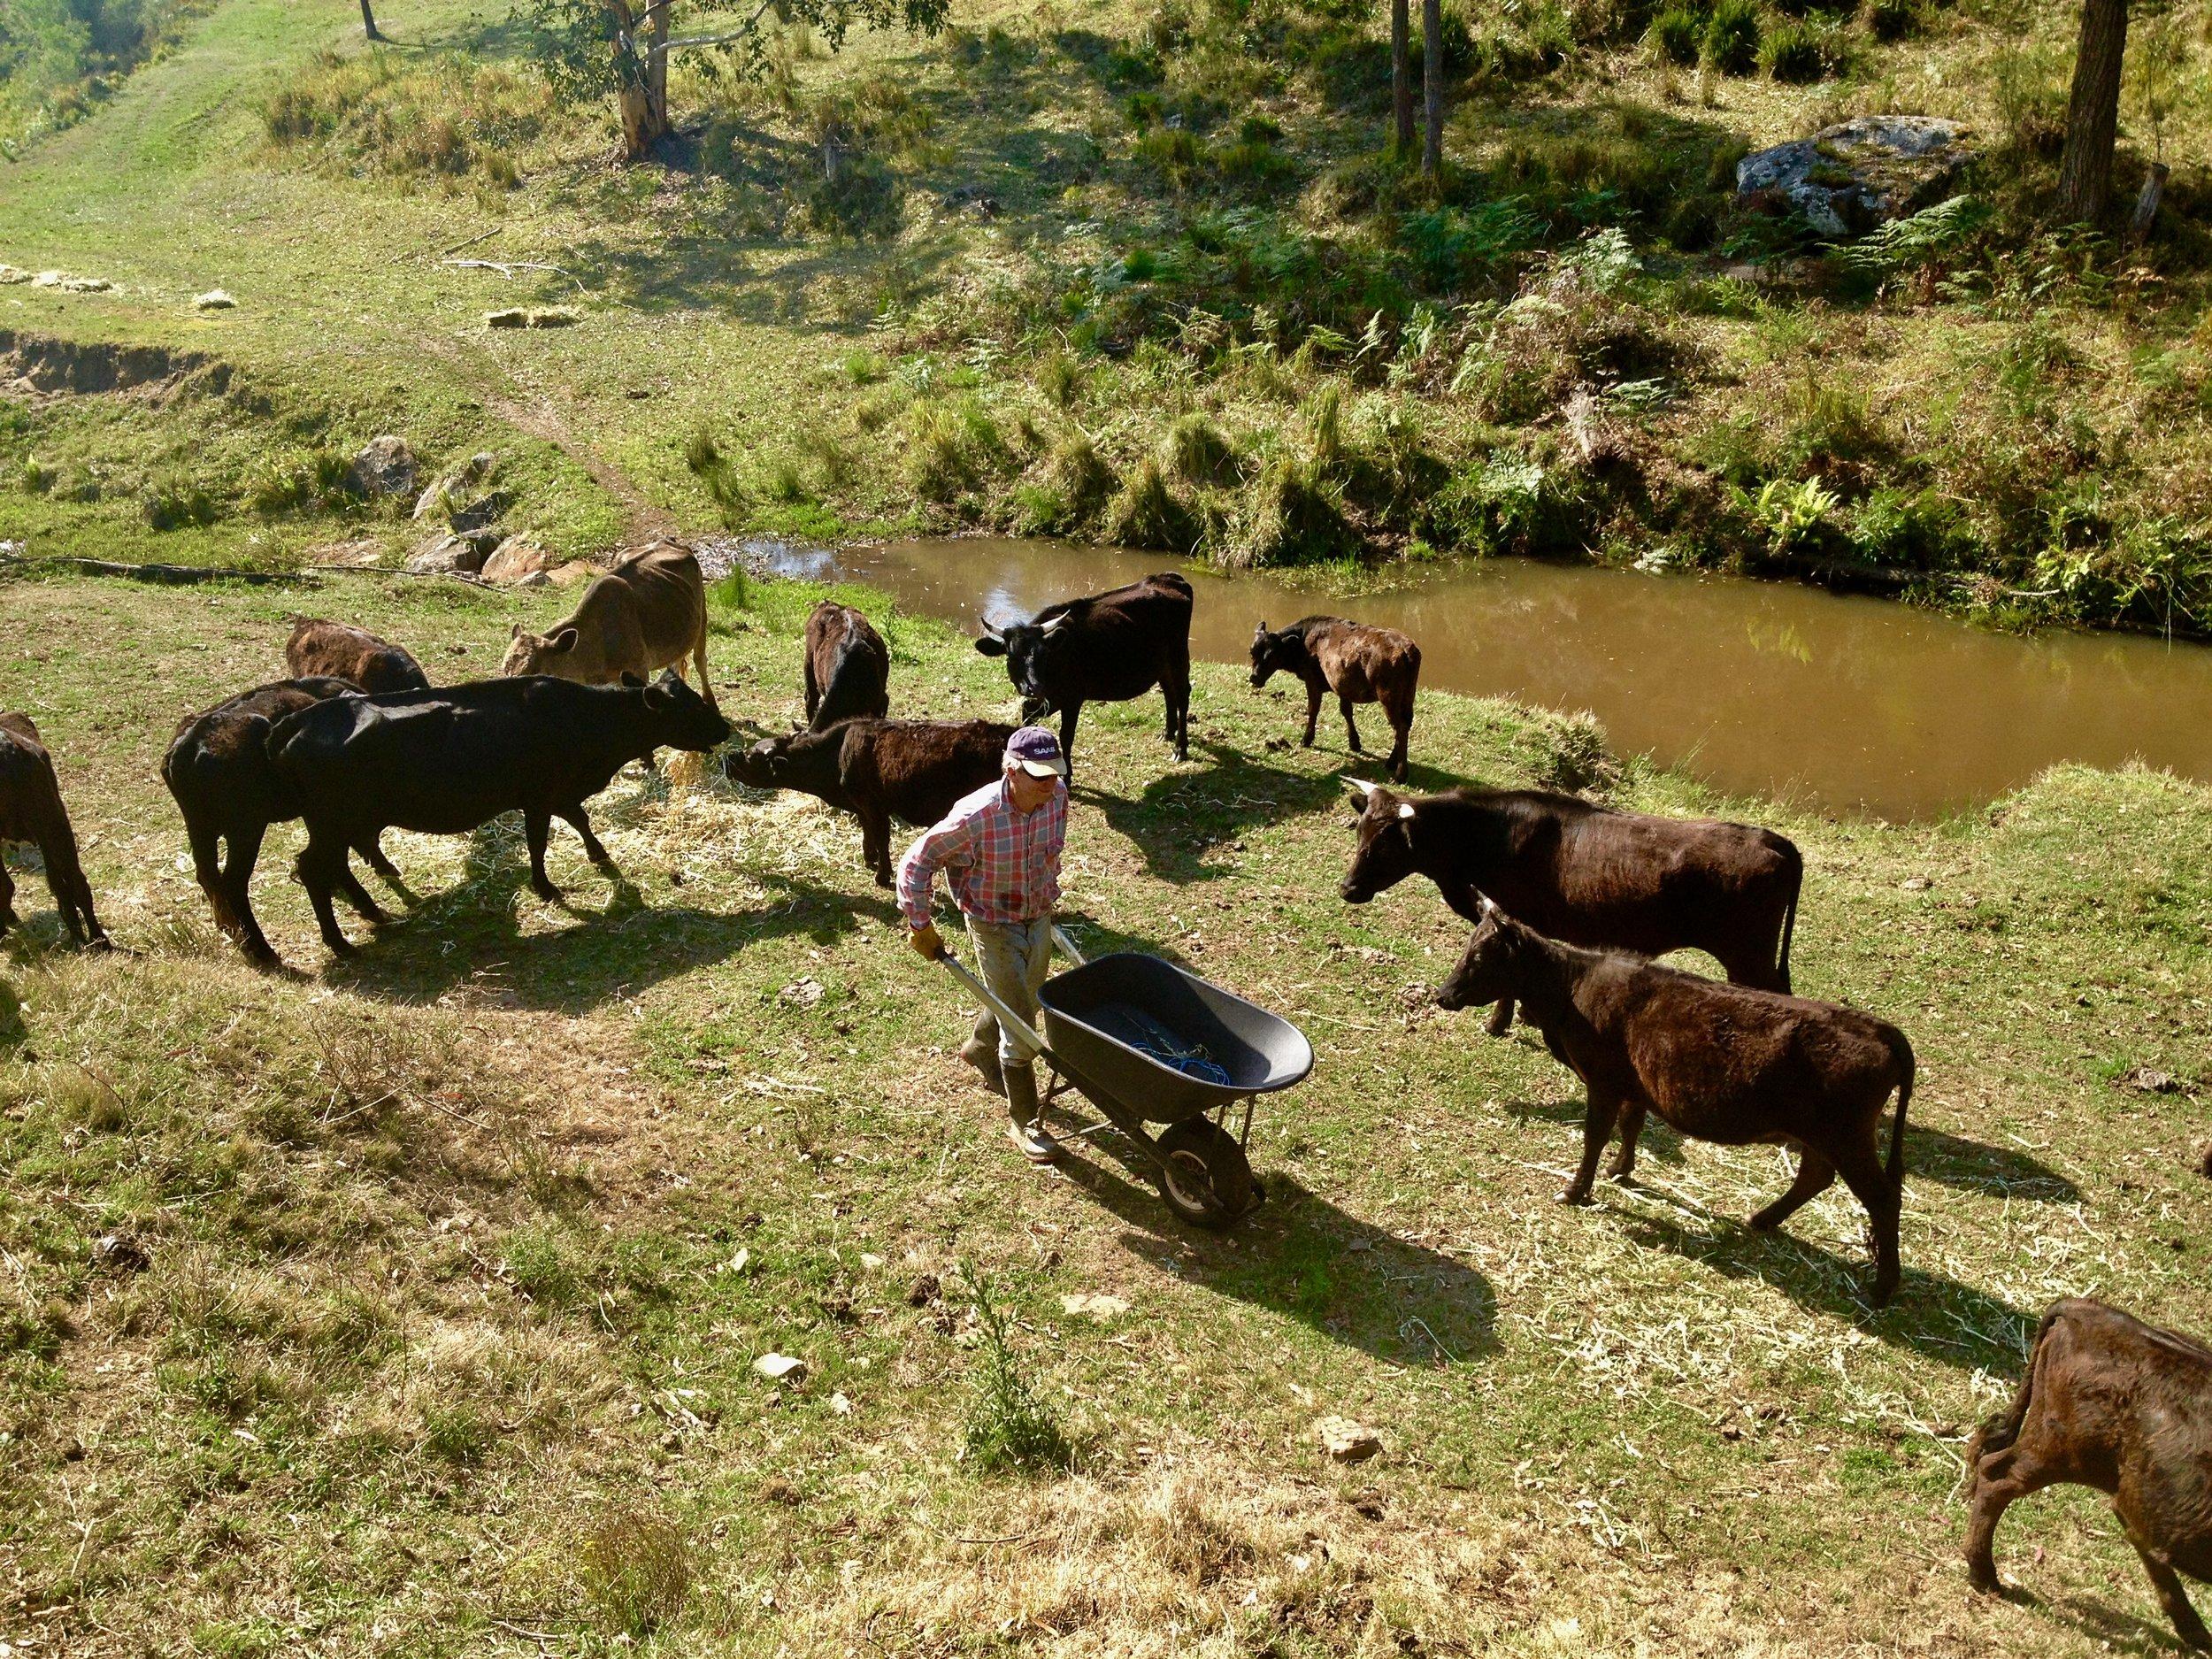 cows and wheel barrow.jpg